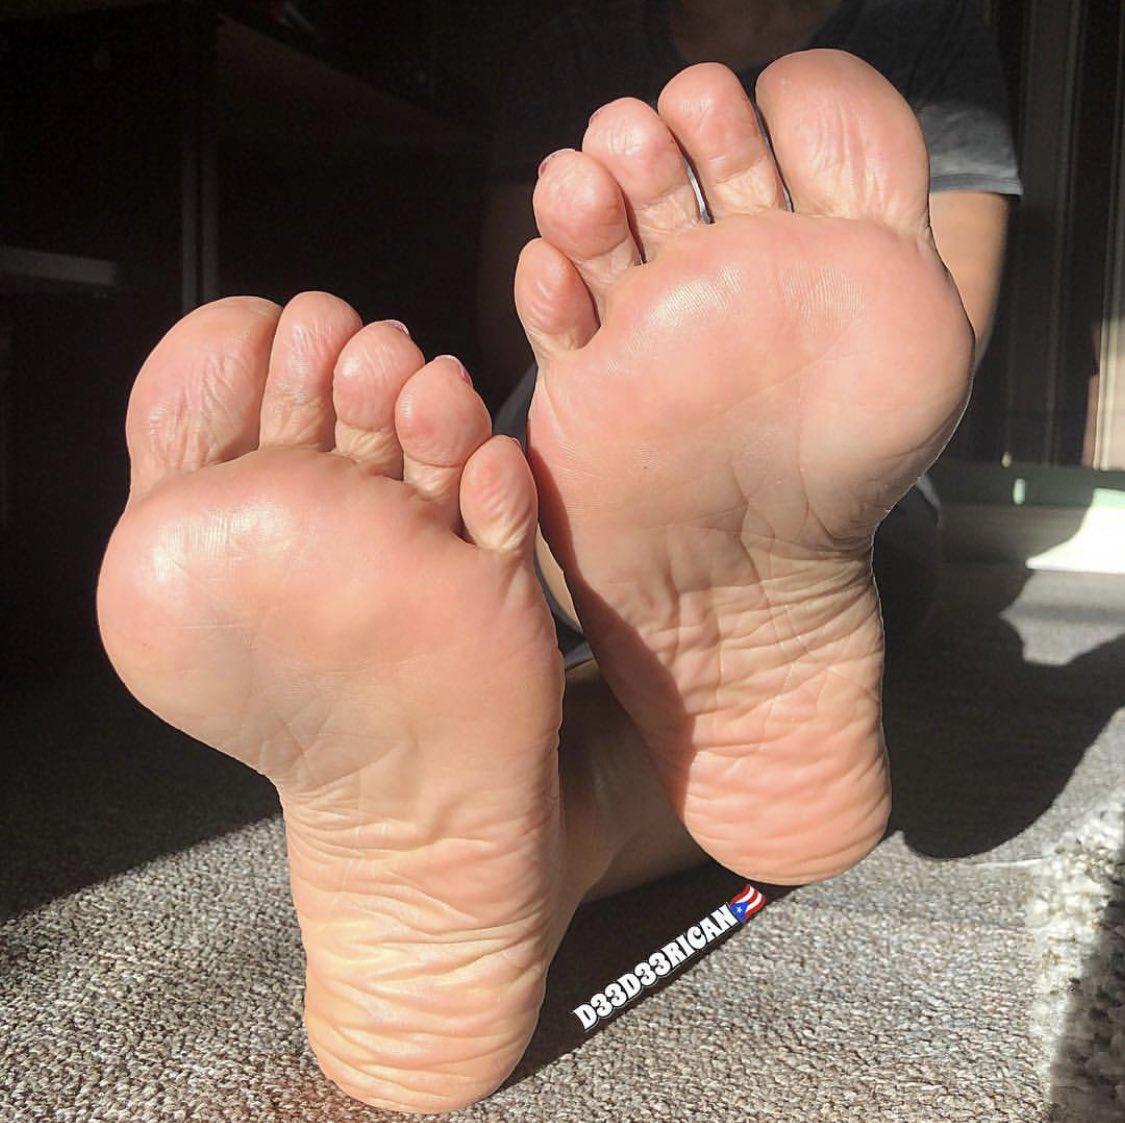 Gross ugly feet